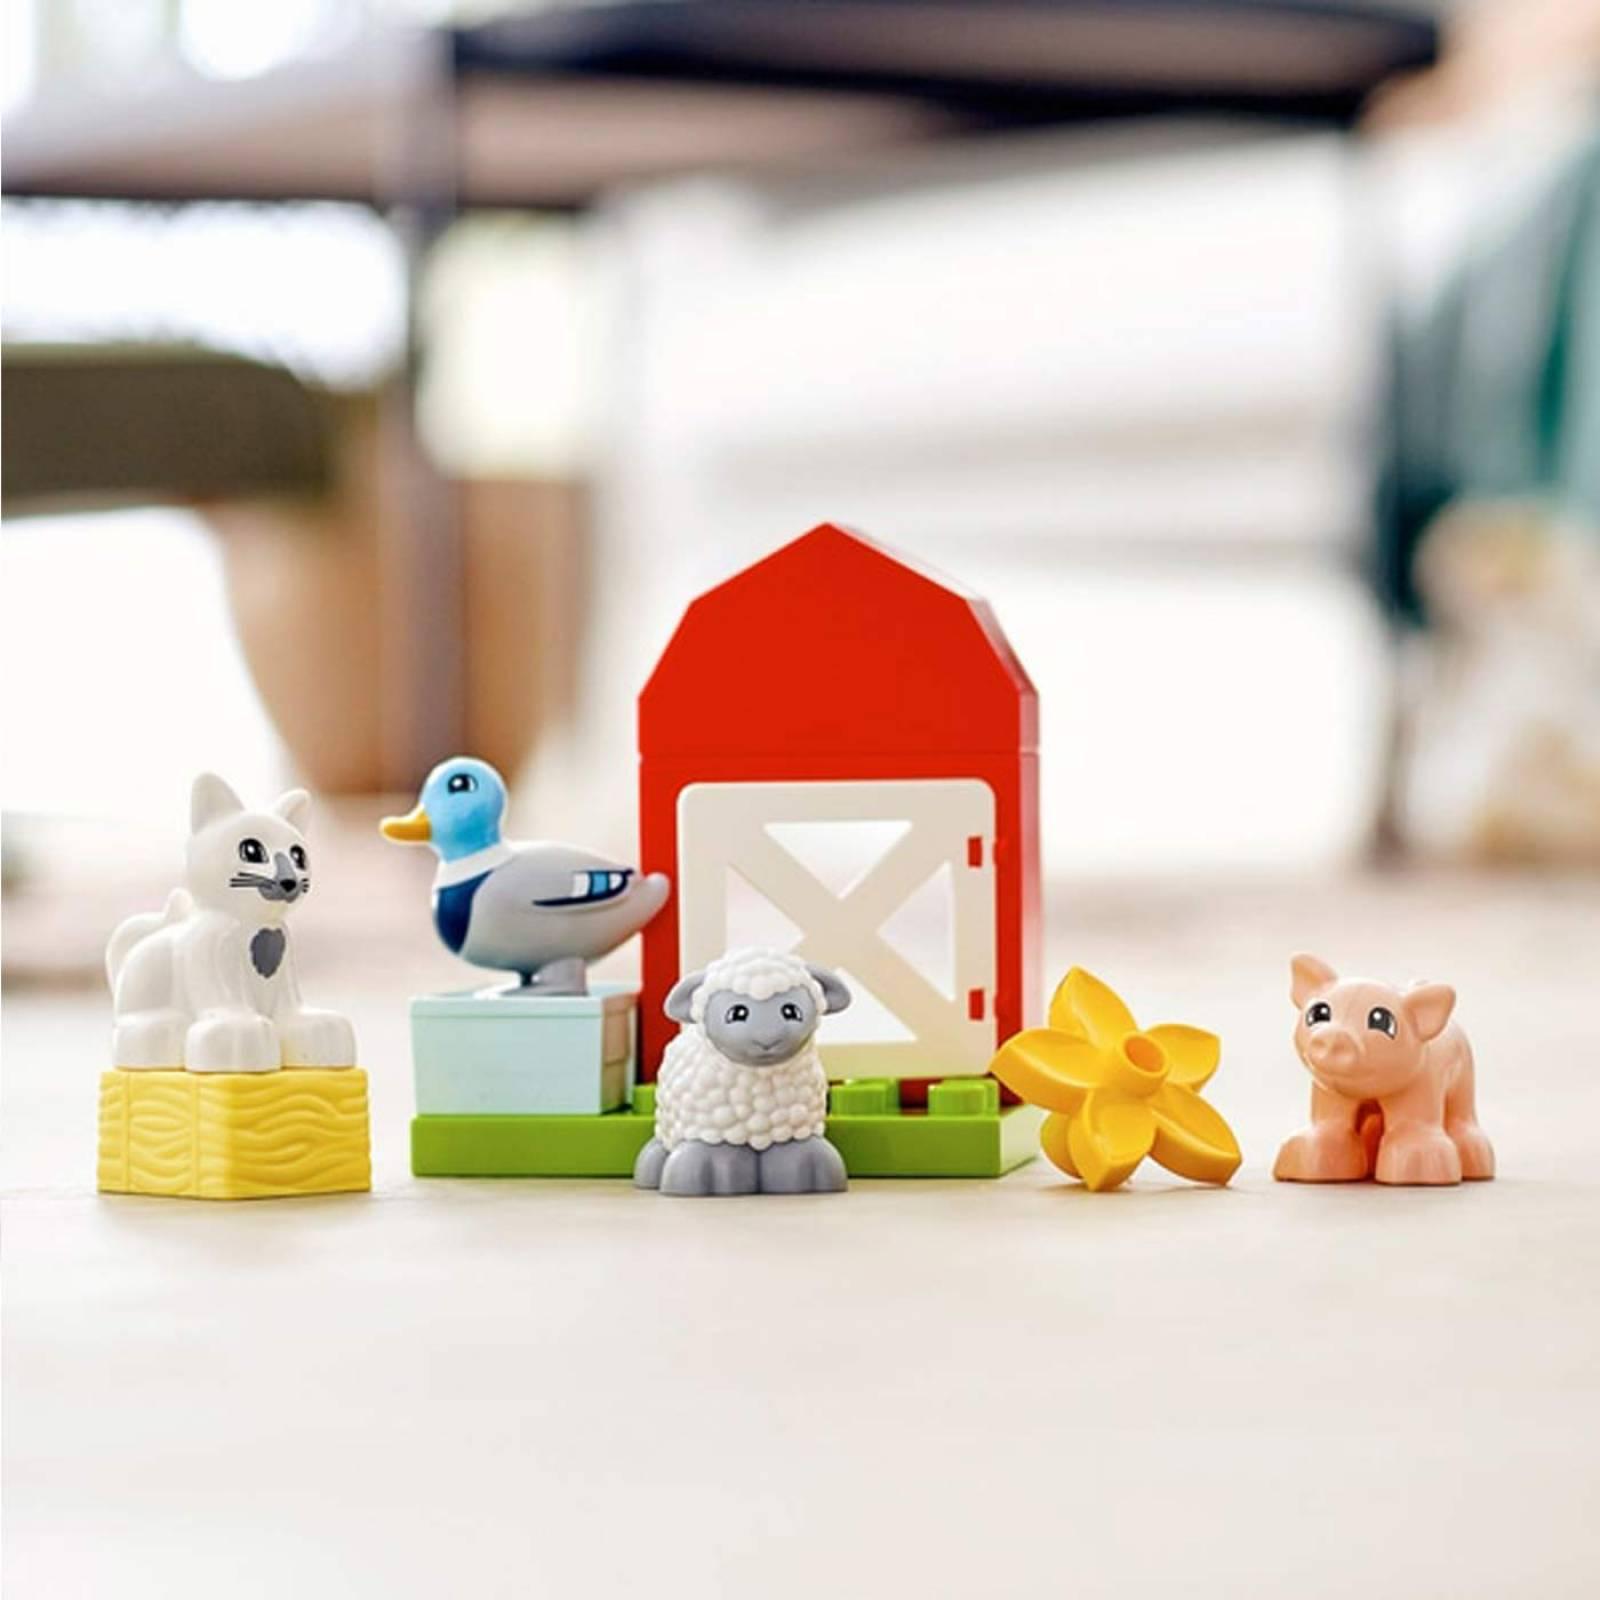 LEGO DUPLO Farm Animal Care 10949 thumbnails